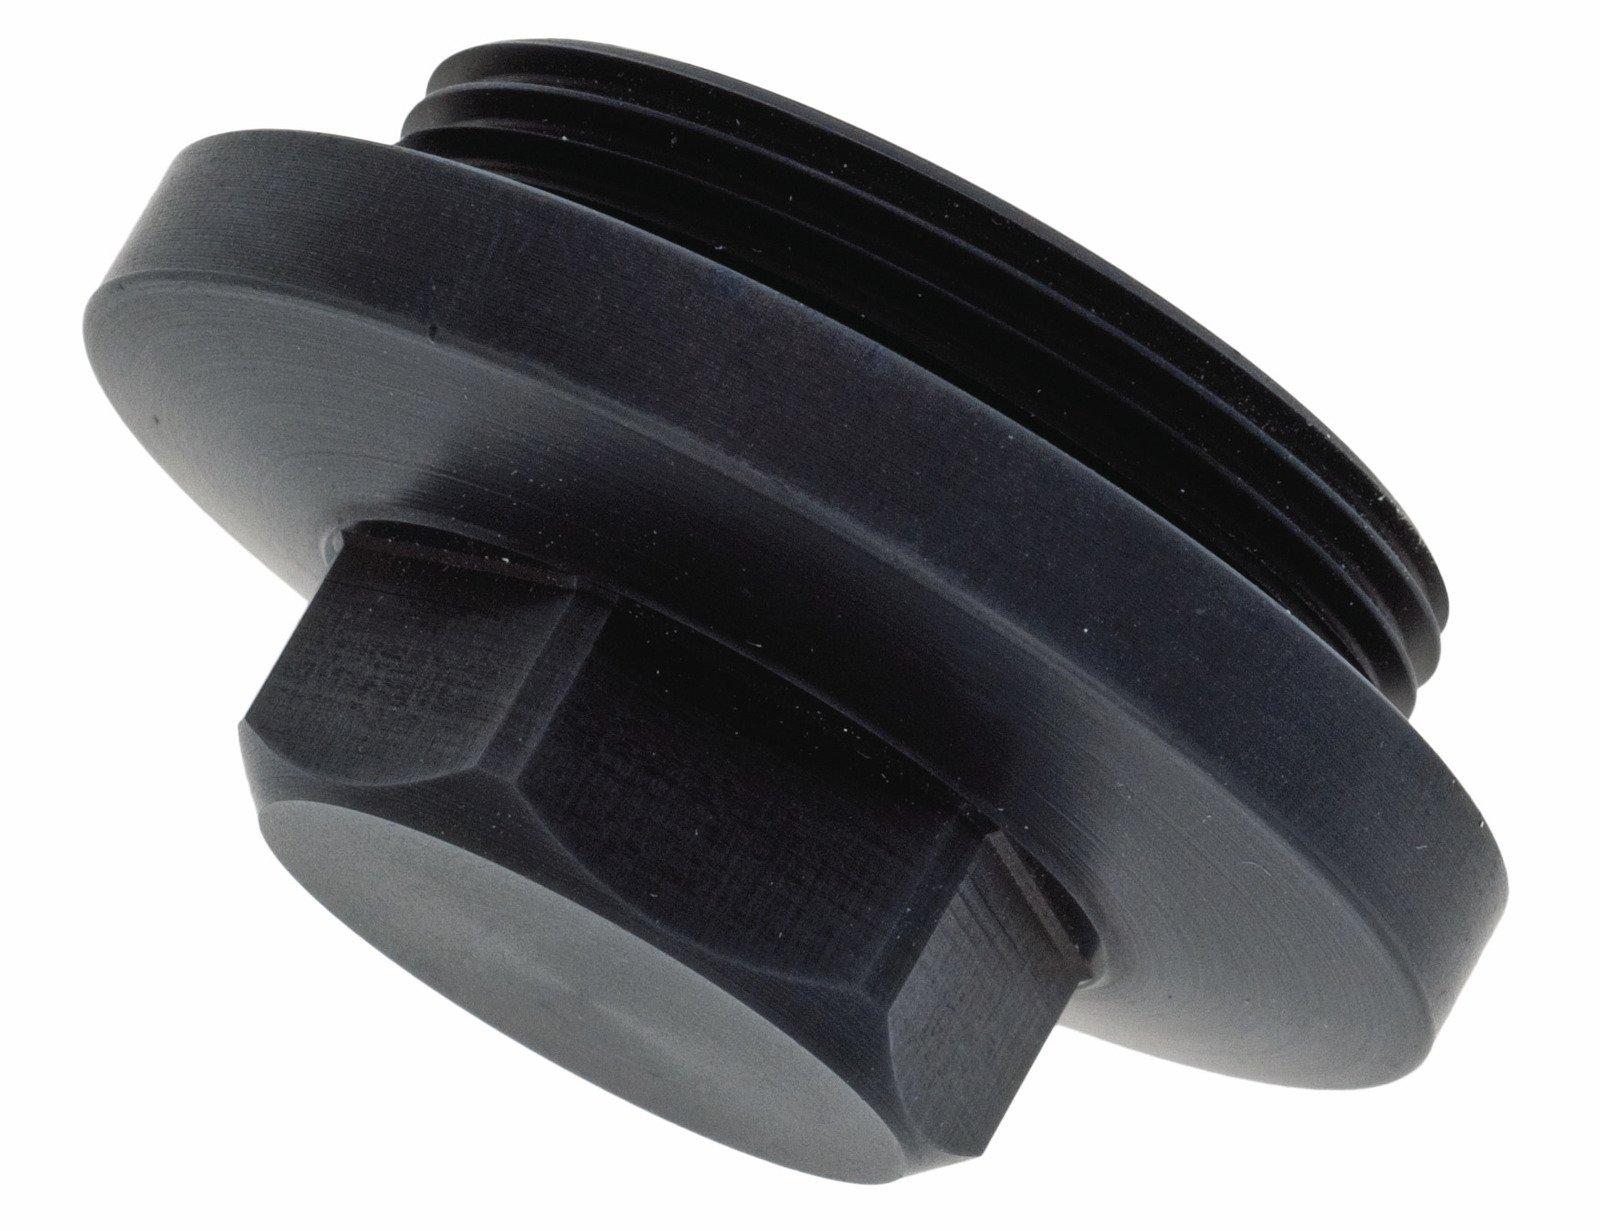 Yamaha XT500 TT500 583-15425-00-00 Ignition Generator Inspection Cover - Black Anodized 00-122